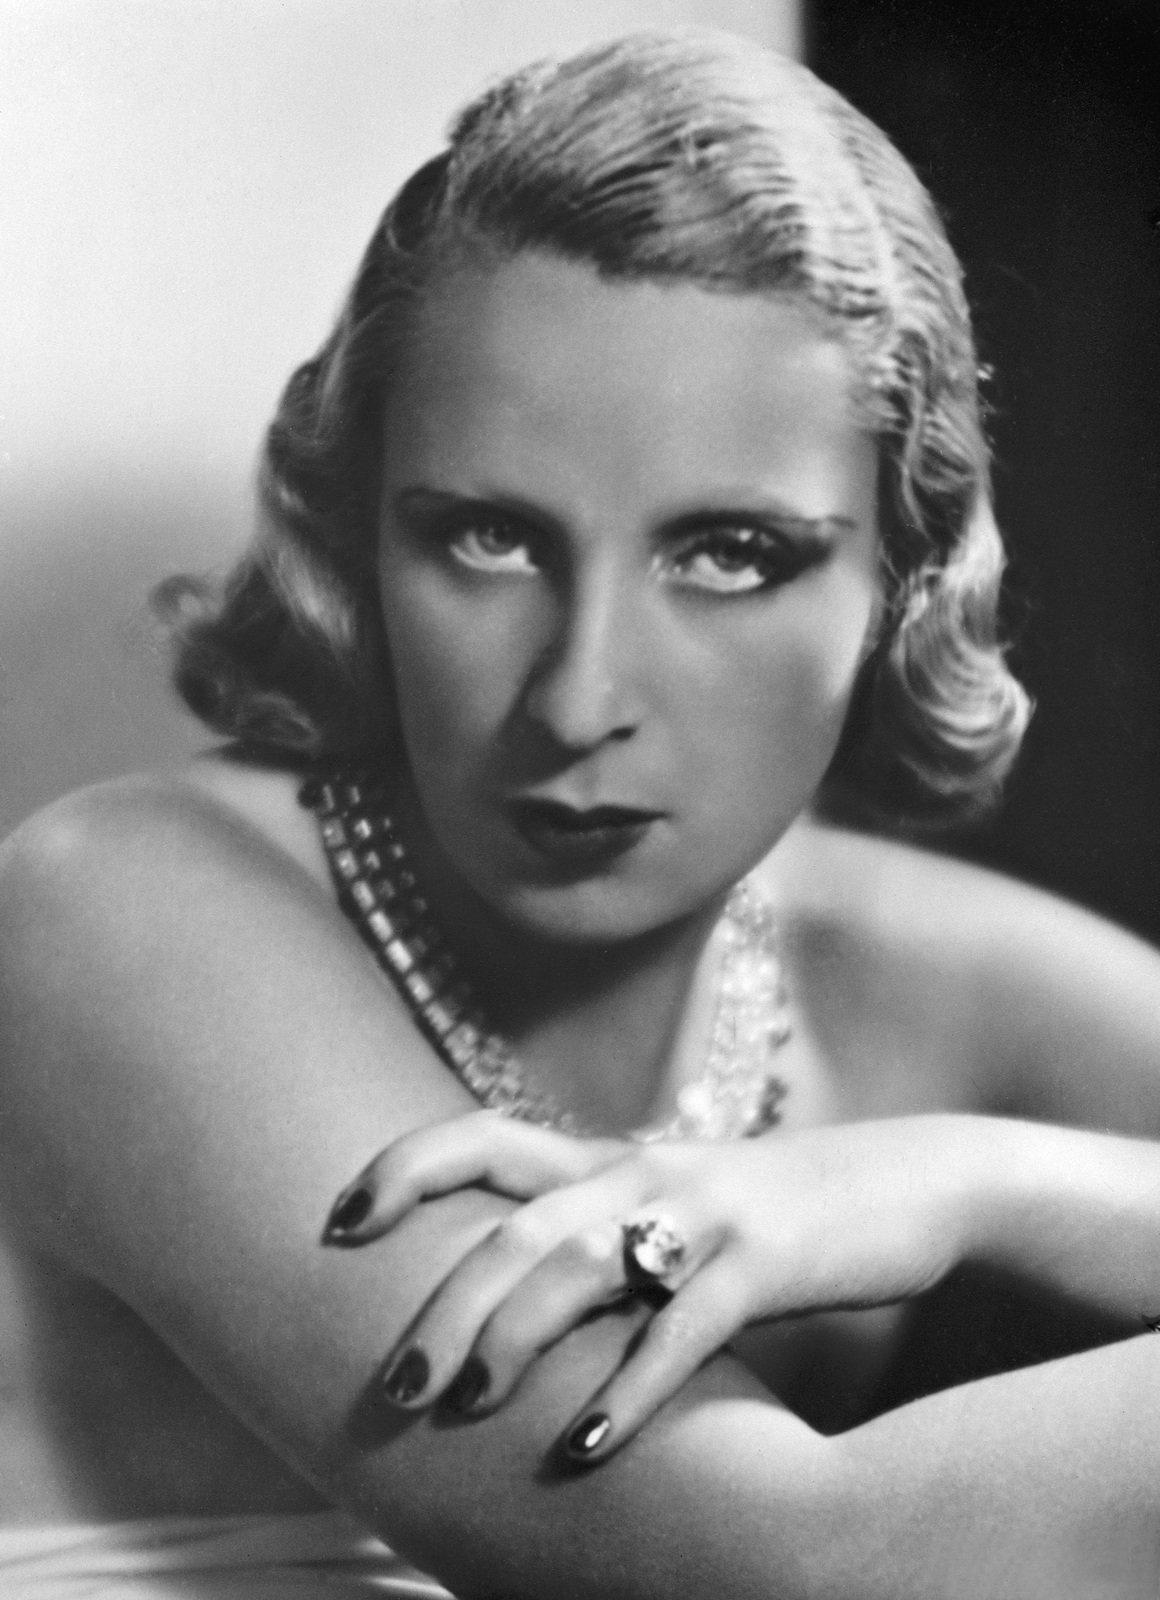 Tamara de Lempicka, 1933, , Topfoto.co.uk, In Copyright